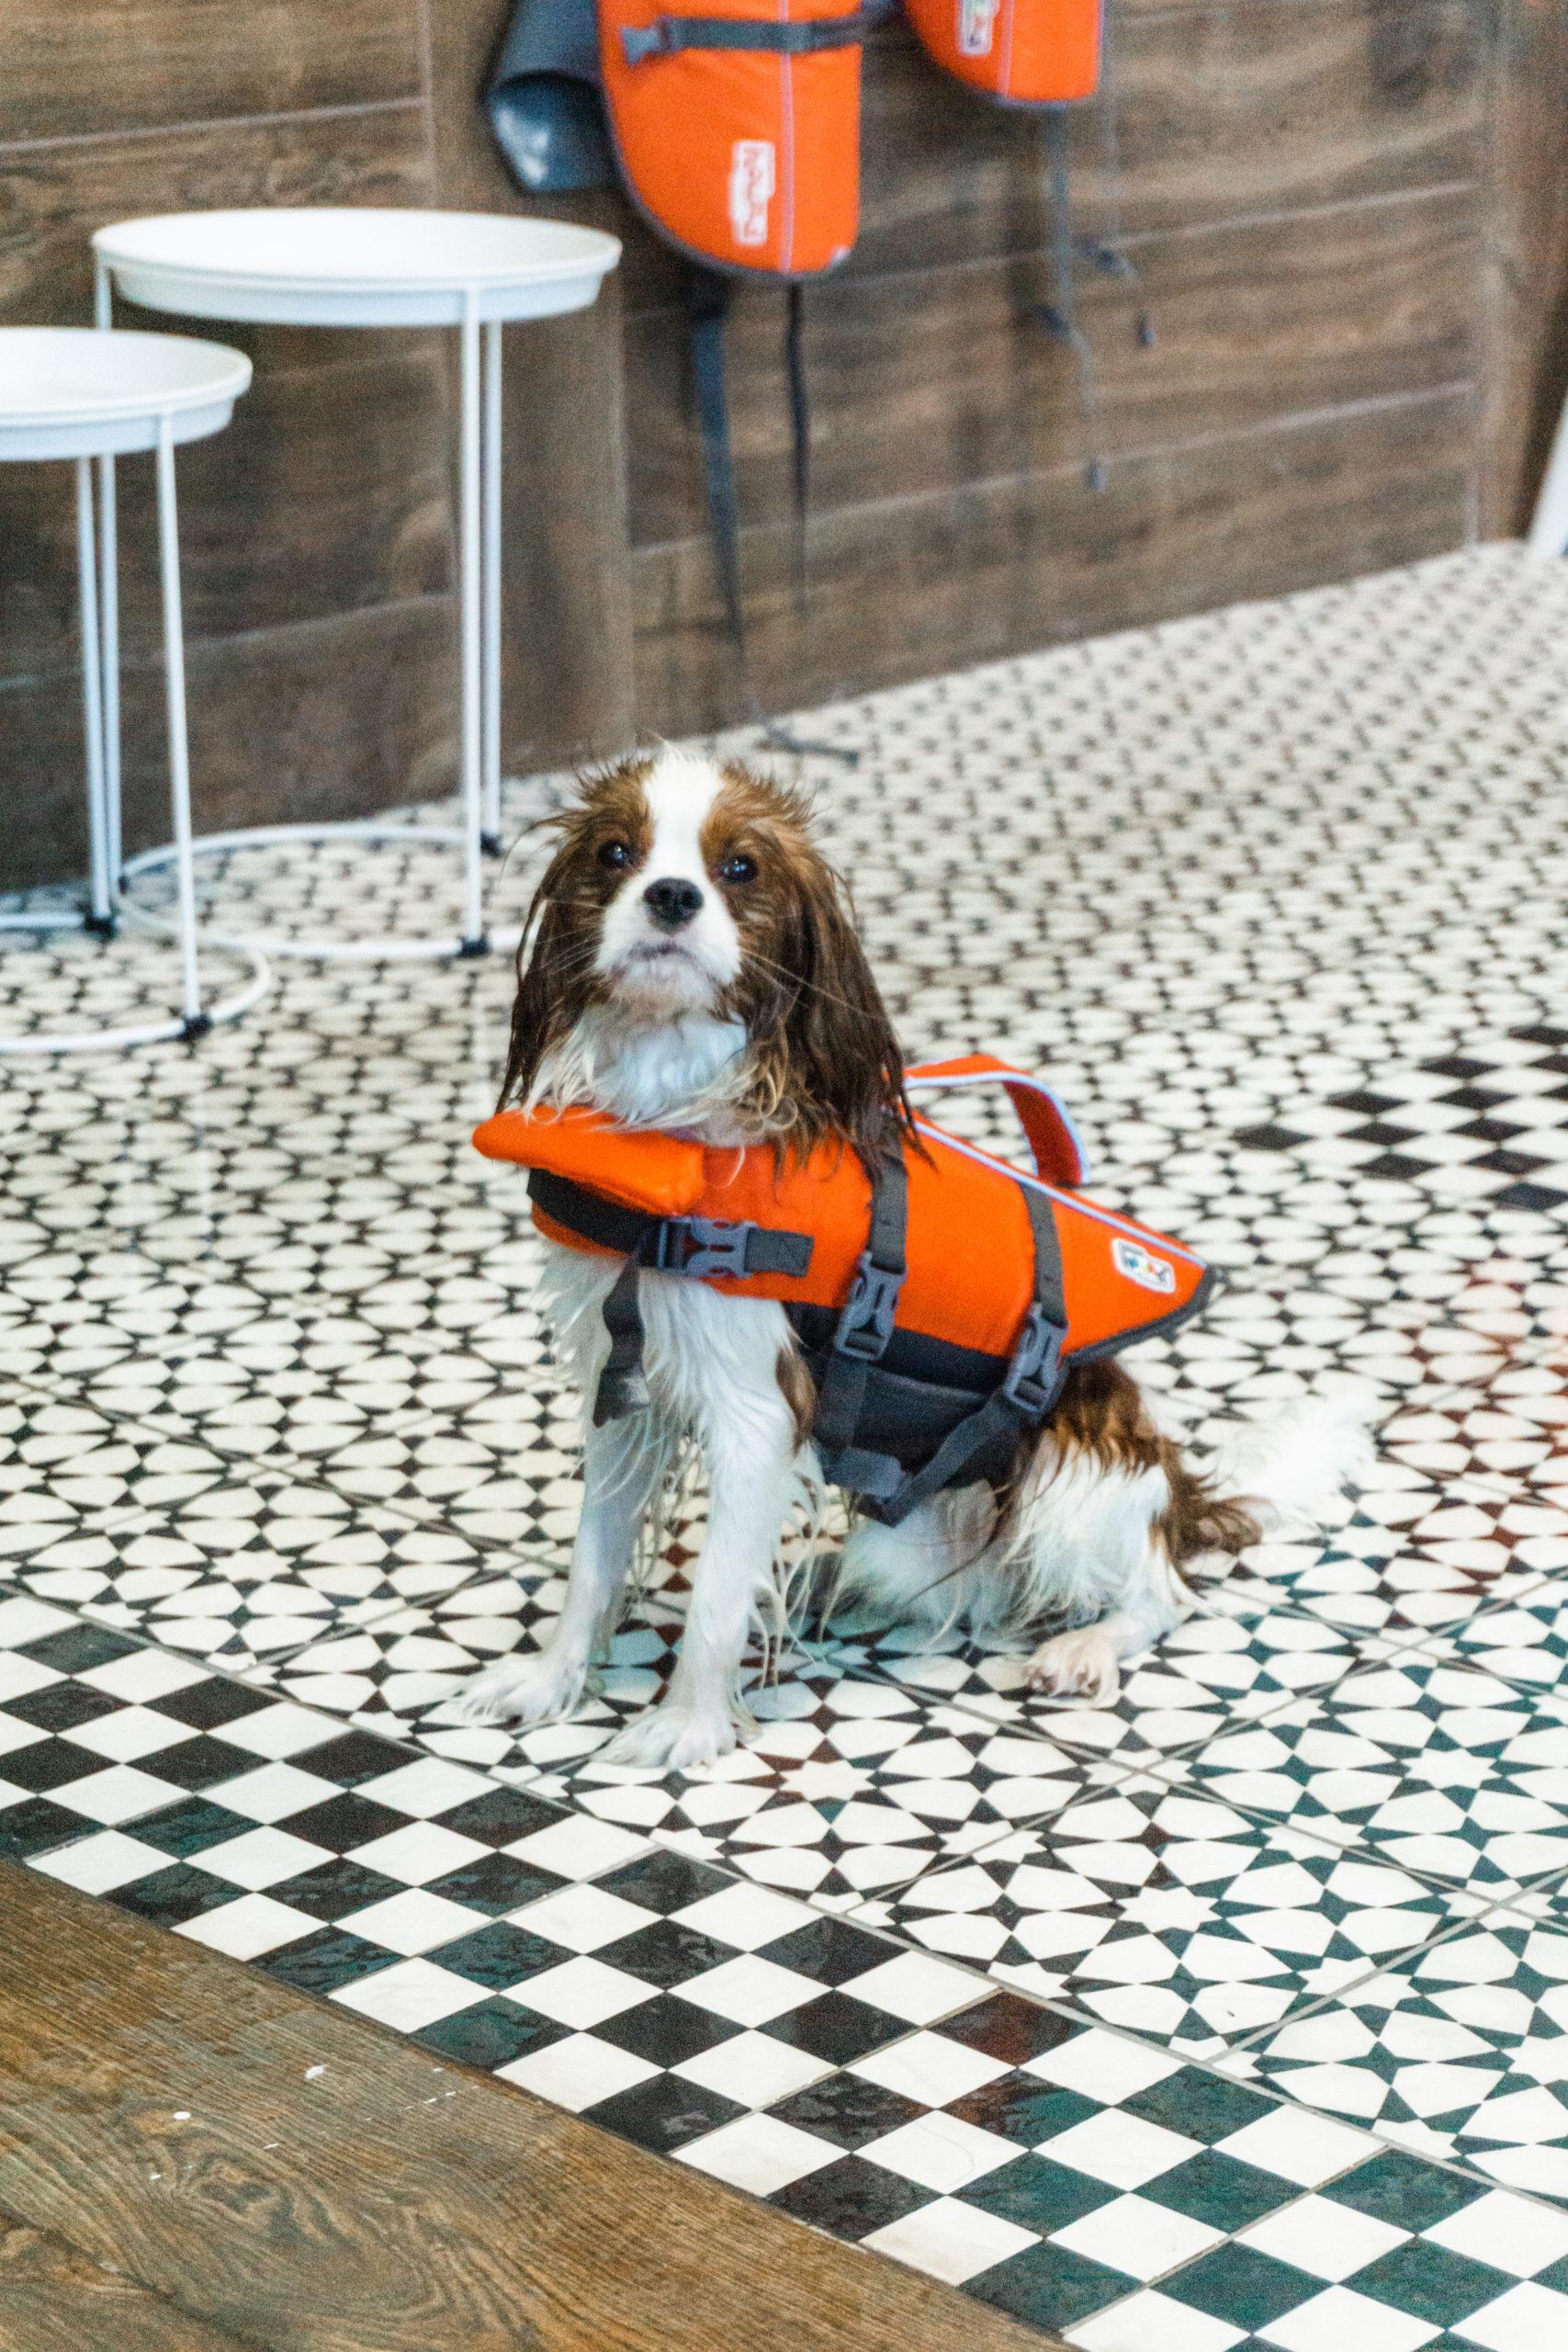 wet dog wearing life vest